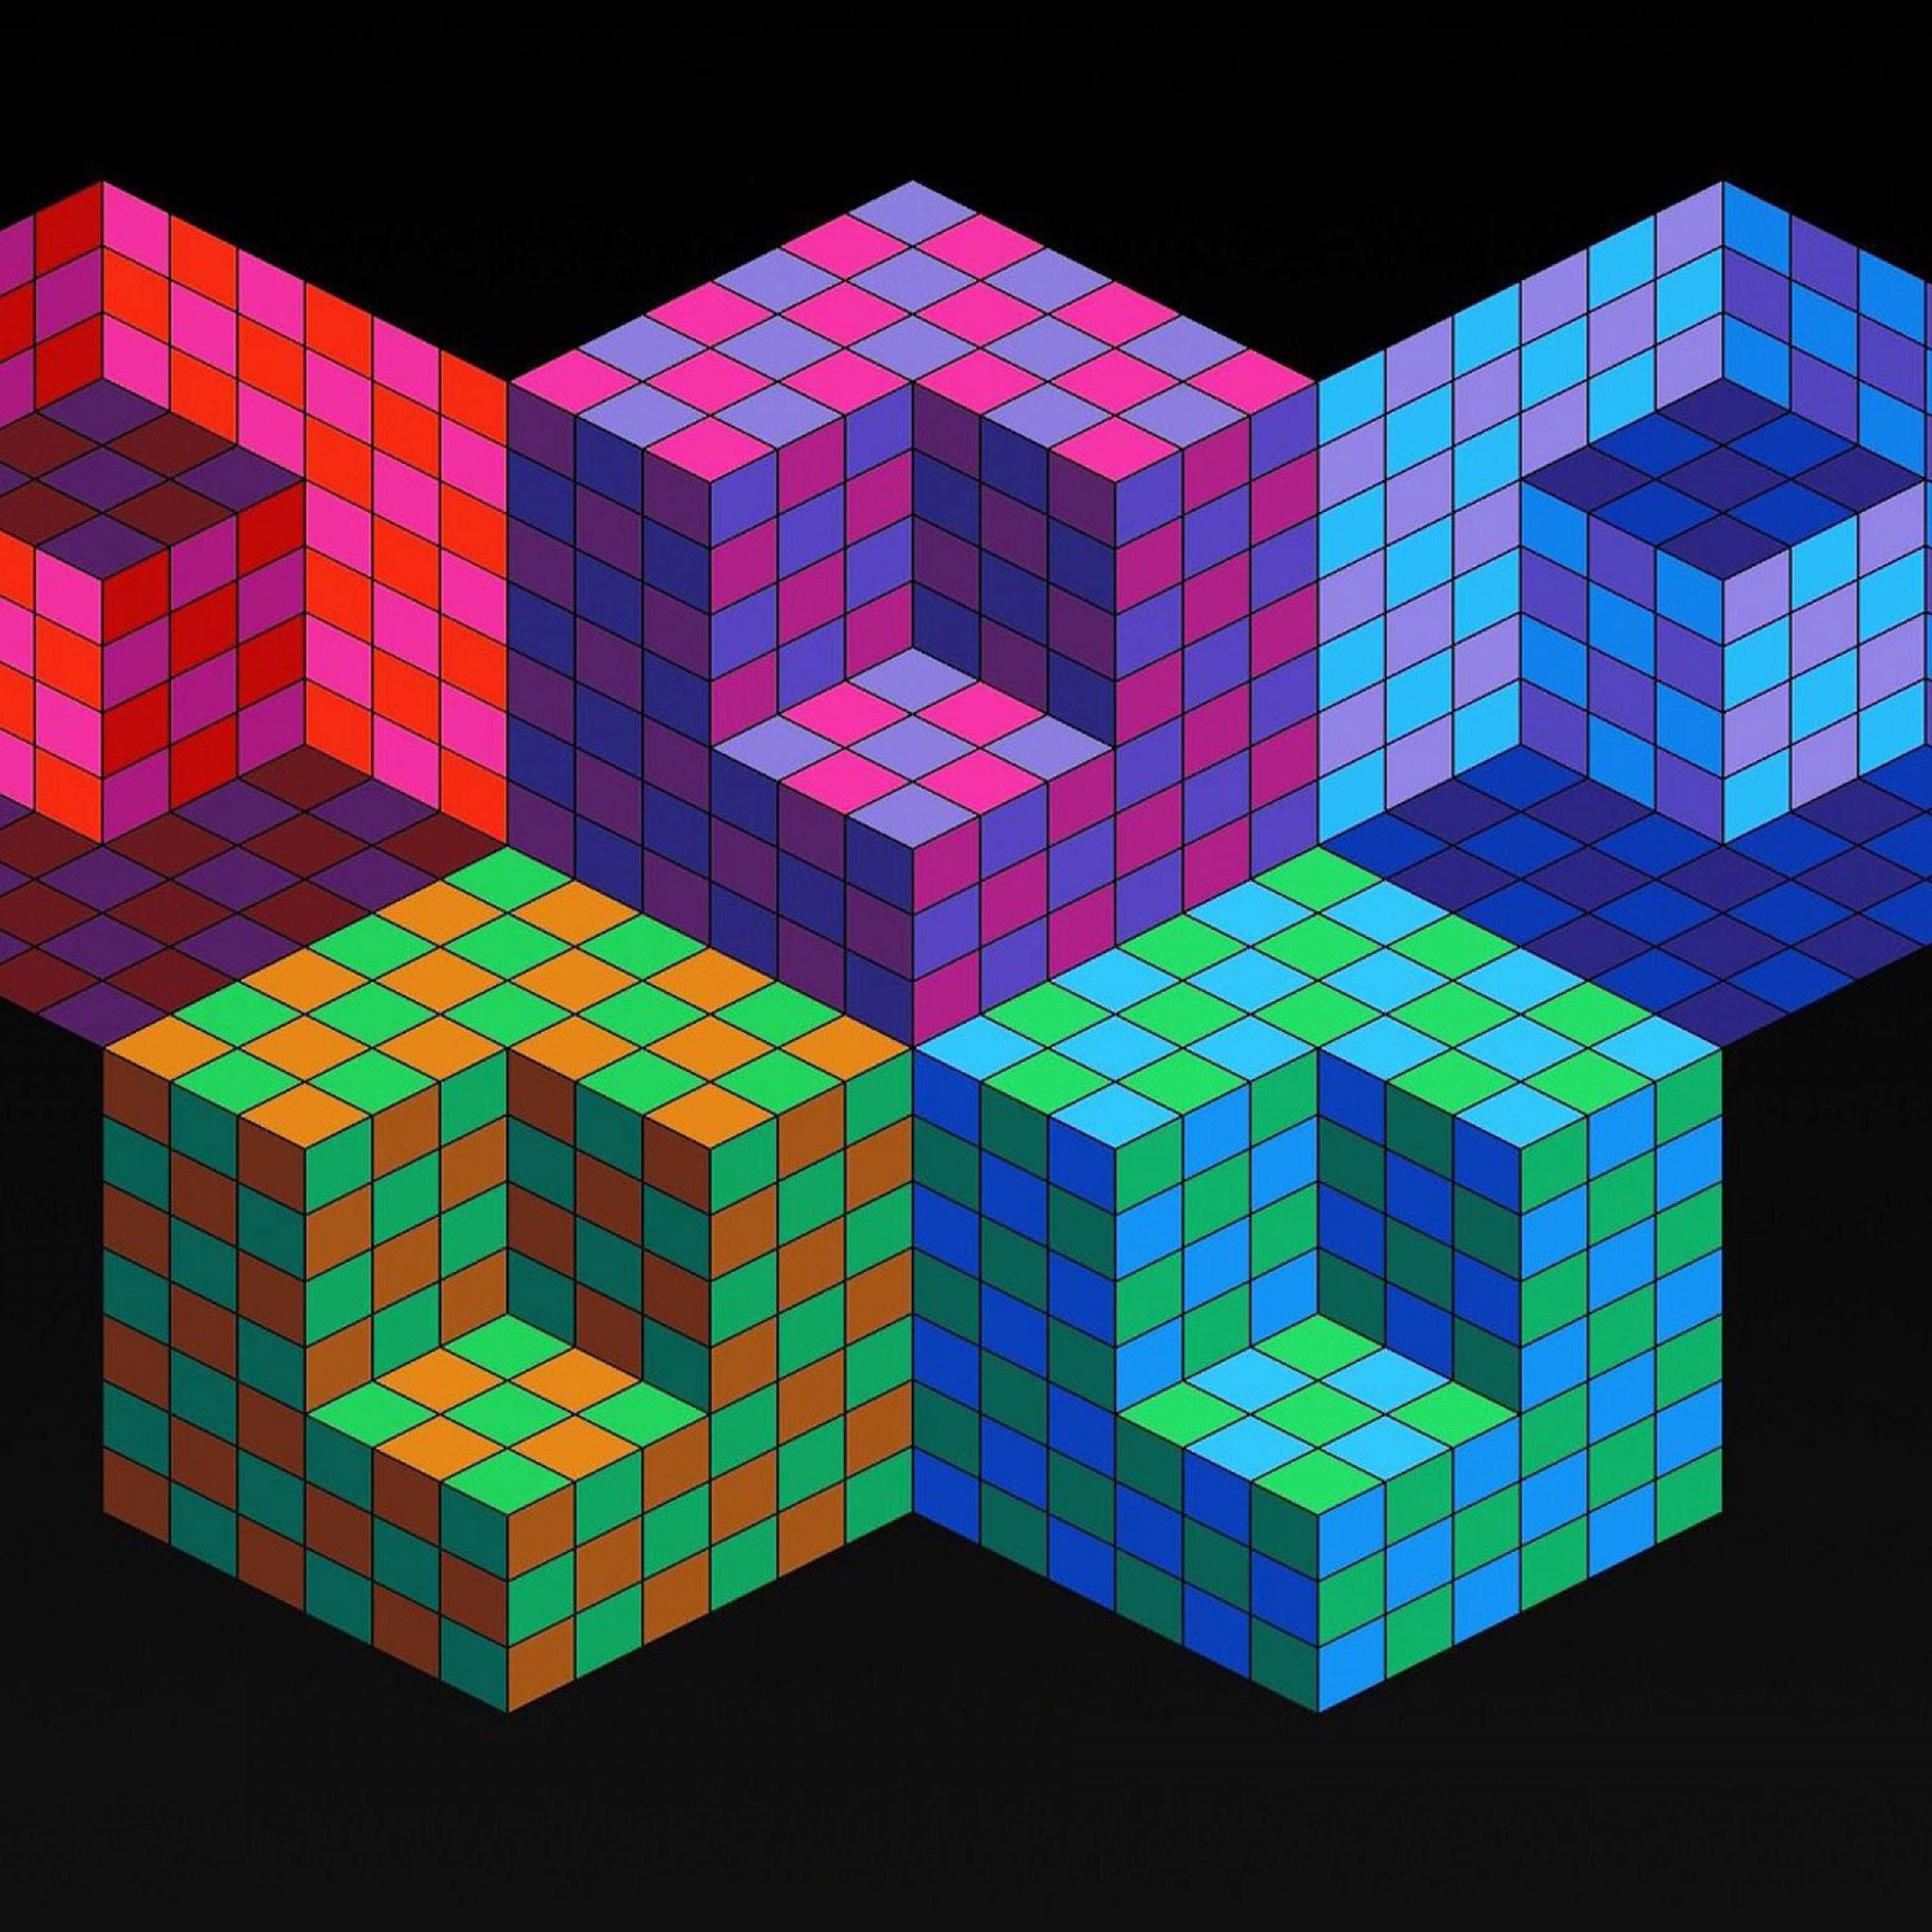 HD Geometric Wallpaper (82+ Images